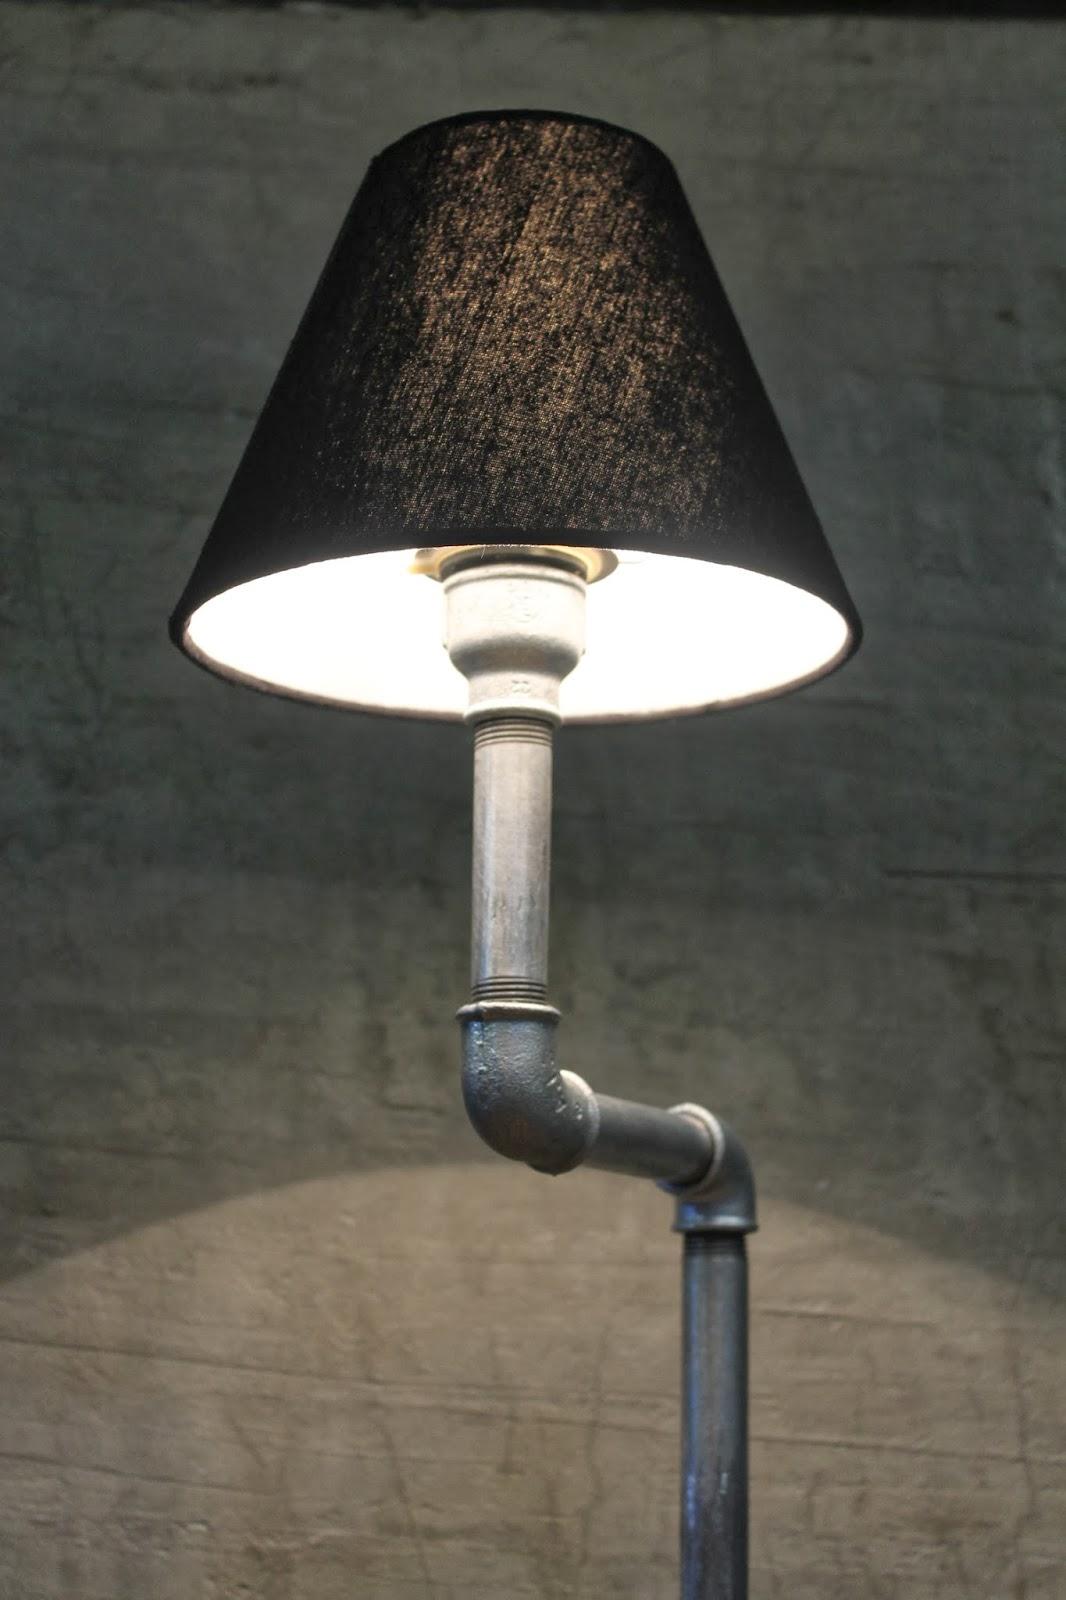 industrial style gusseisen rohr lampe auf betonsockel snakytube. Black Bedroom Furniture Sets. Home Design Ideas